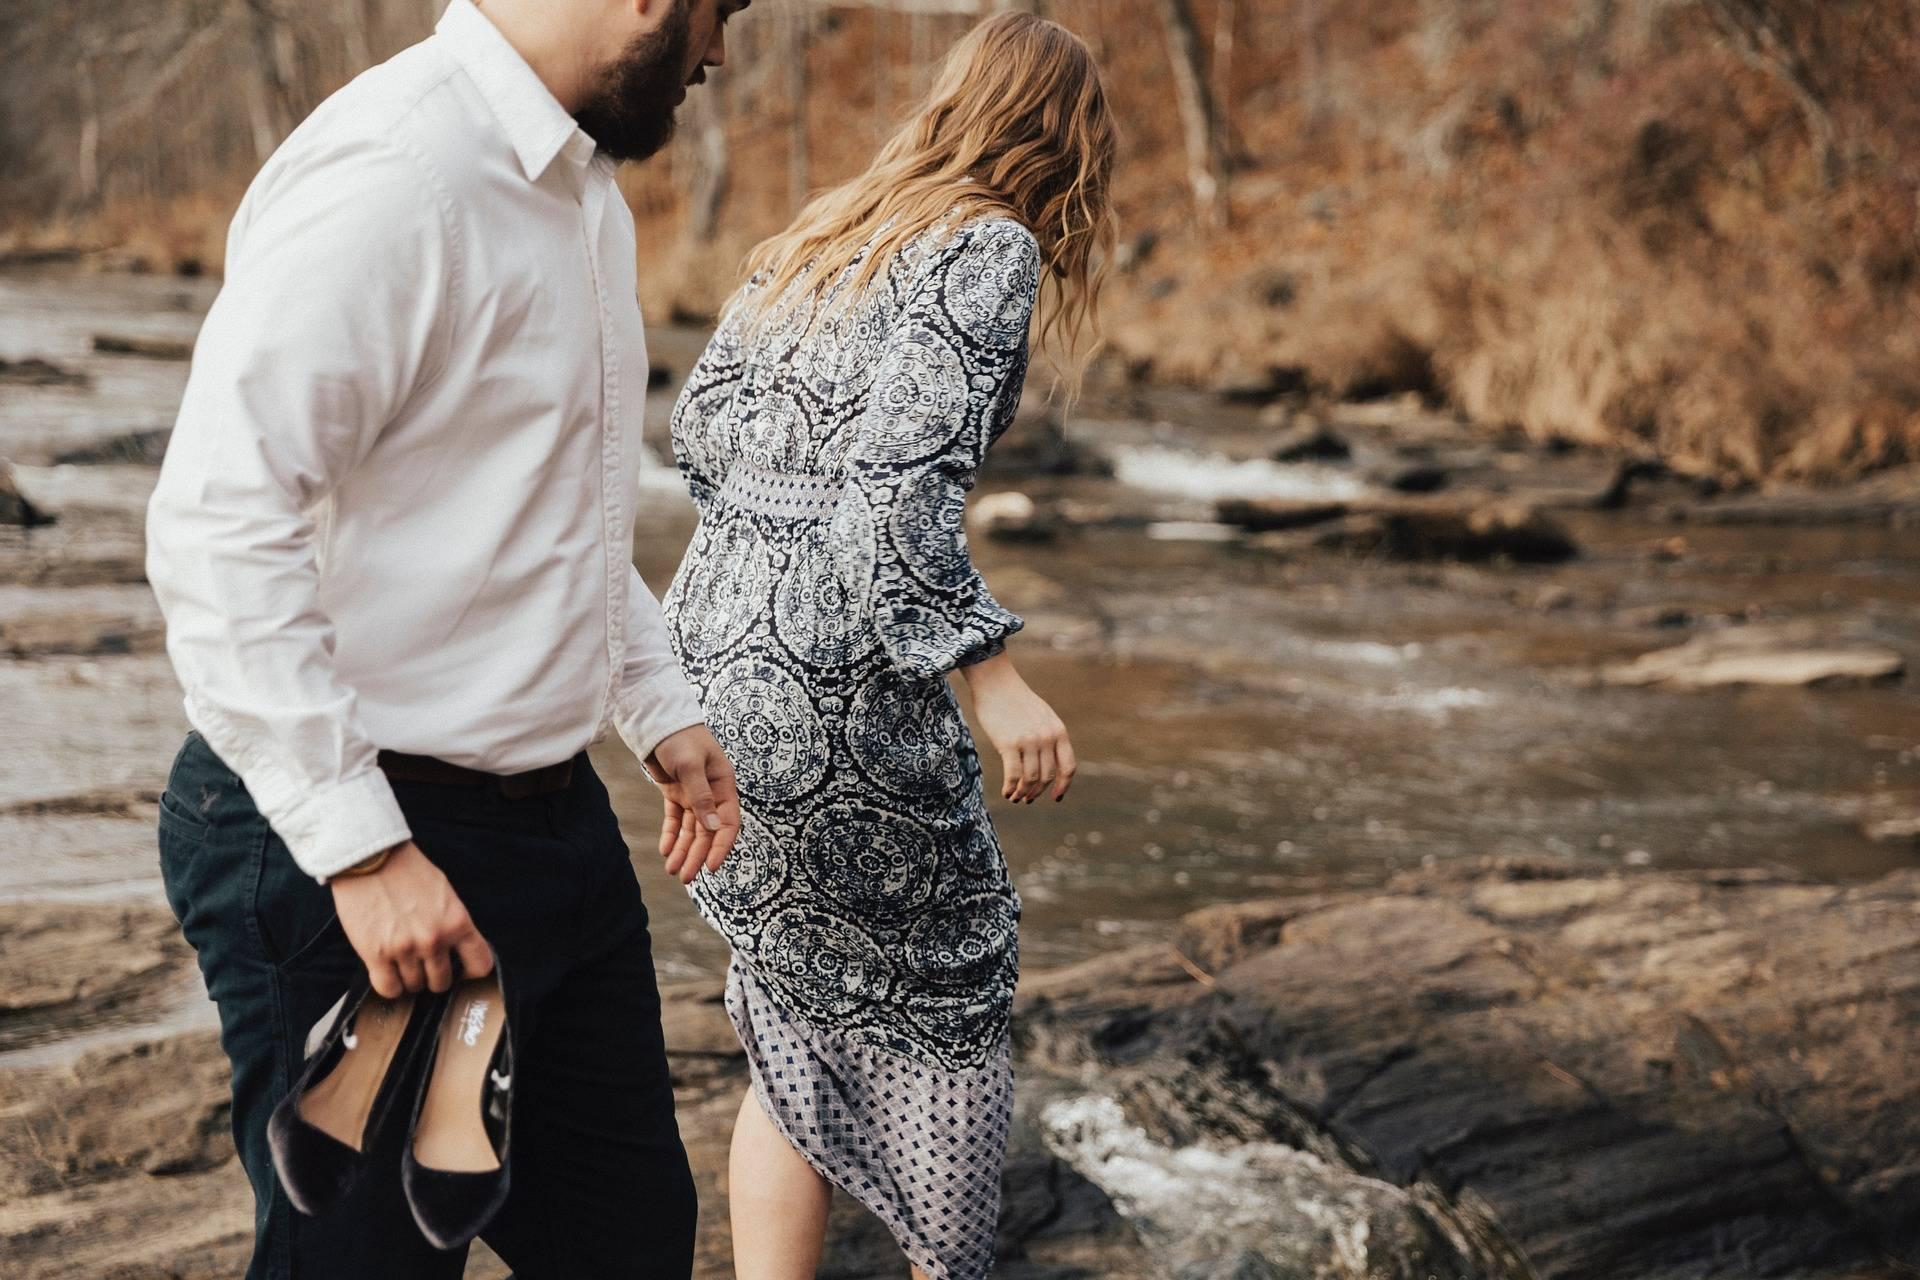 Classy Gentleman: Court a Woman &  Do it Like One